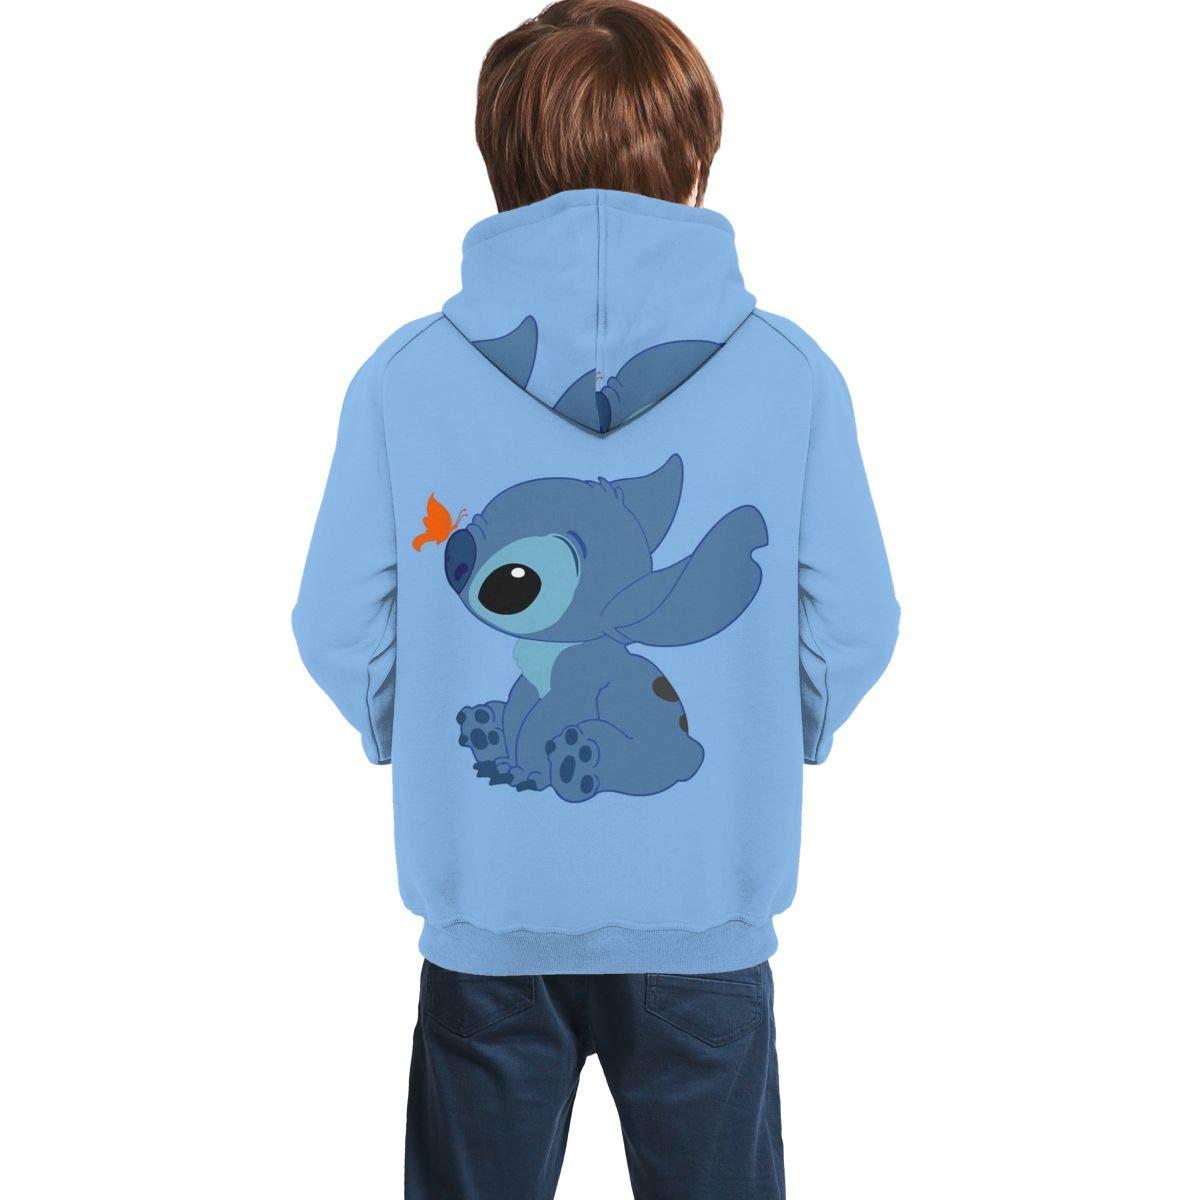 Eleebala Lilo and Stitch Butterfly Teen Girls Boys Hoodie Pullover Sweatshirt